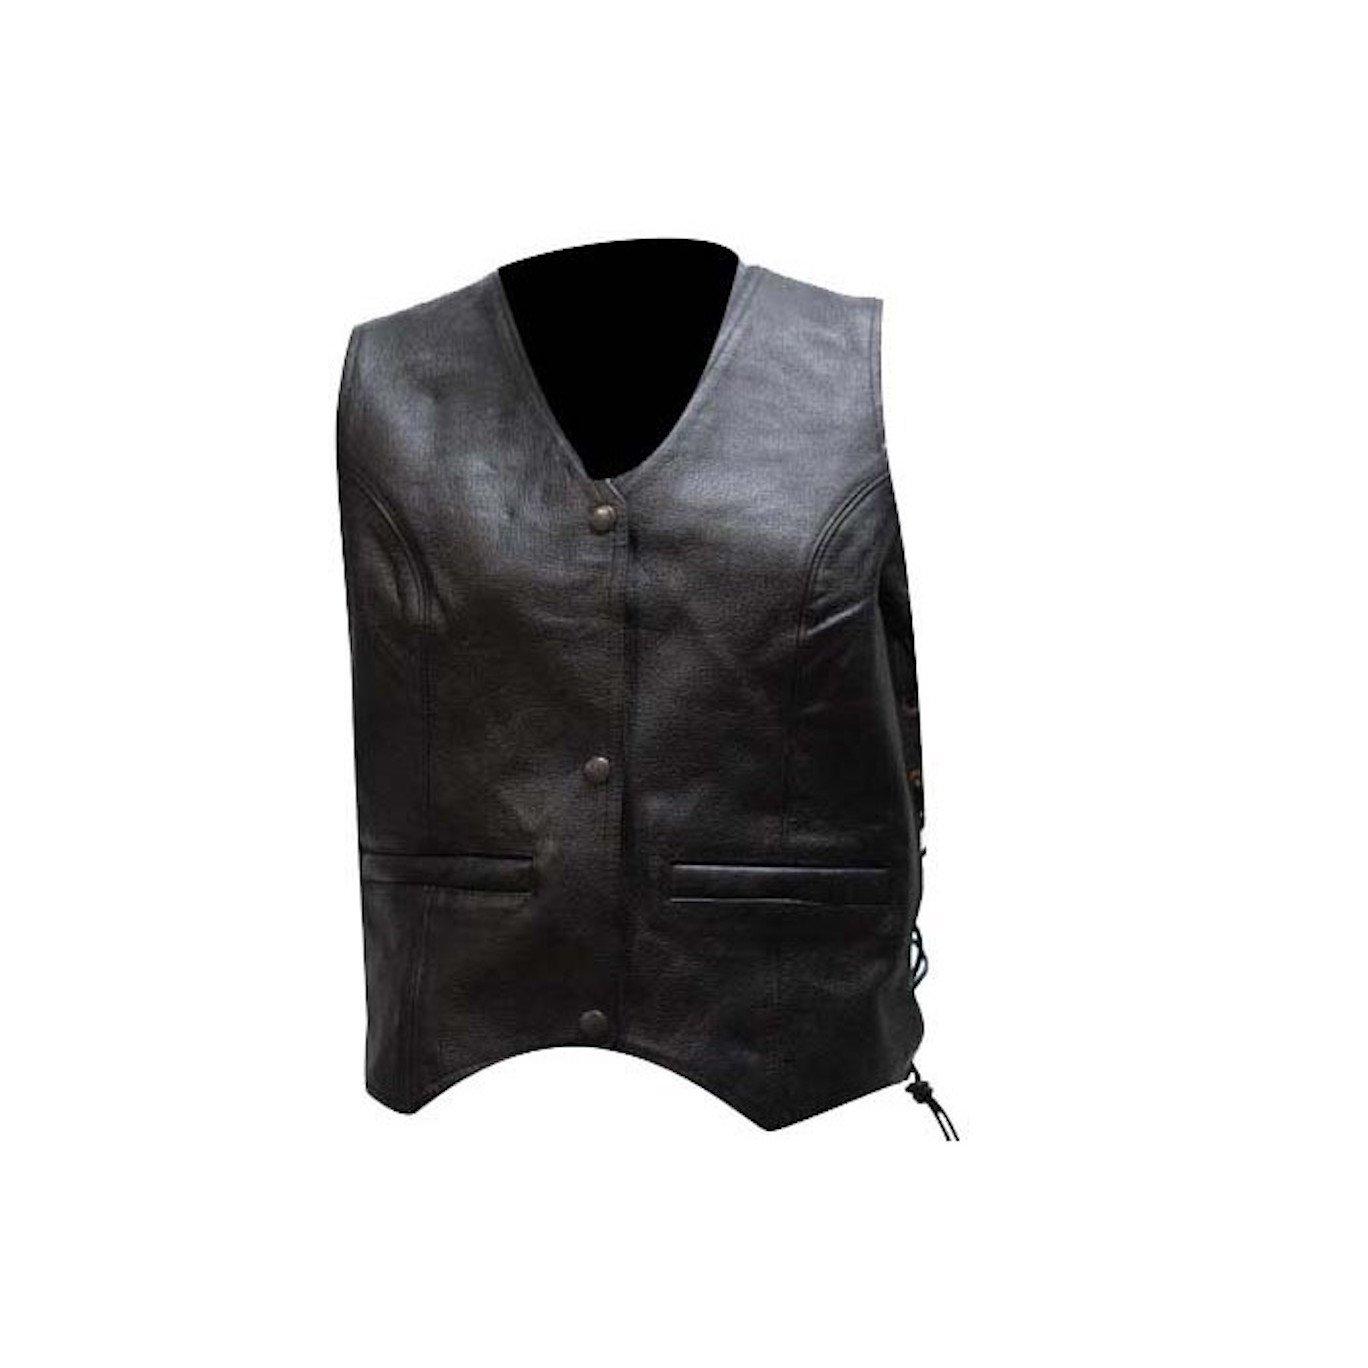 Women's Classic Style Plain Motorcycle Vest With Gun Pockets (4XL, Black)